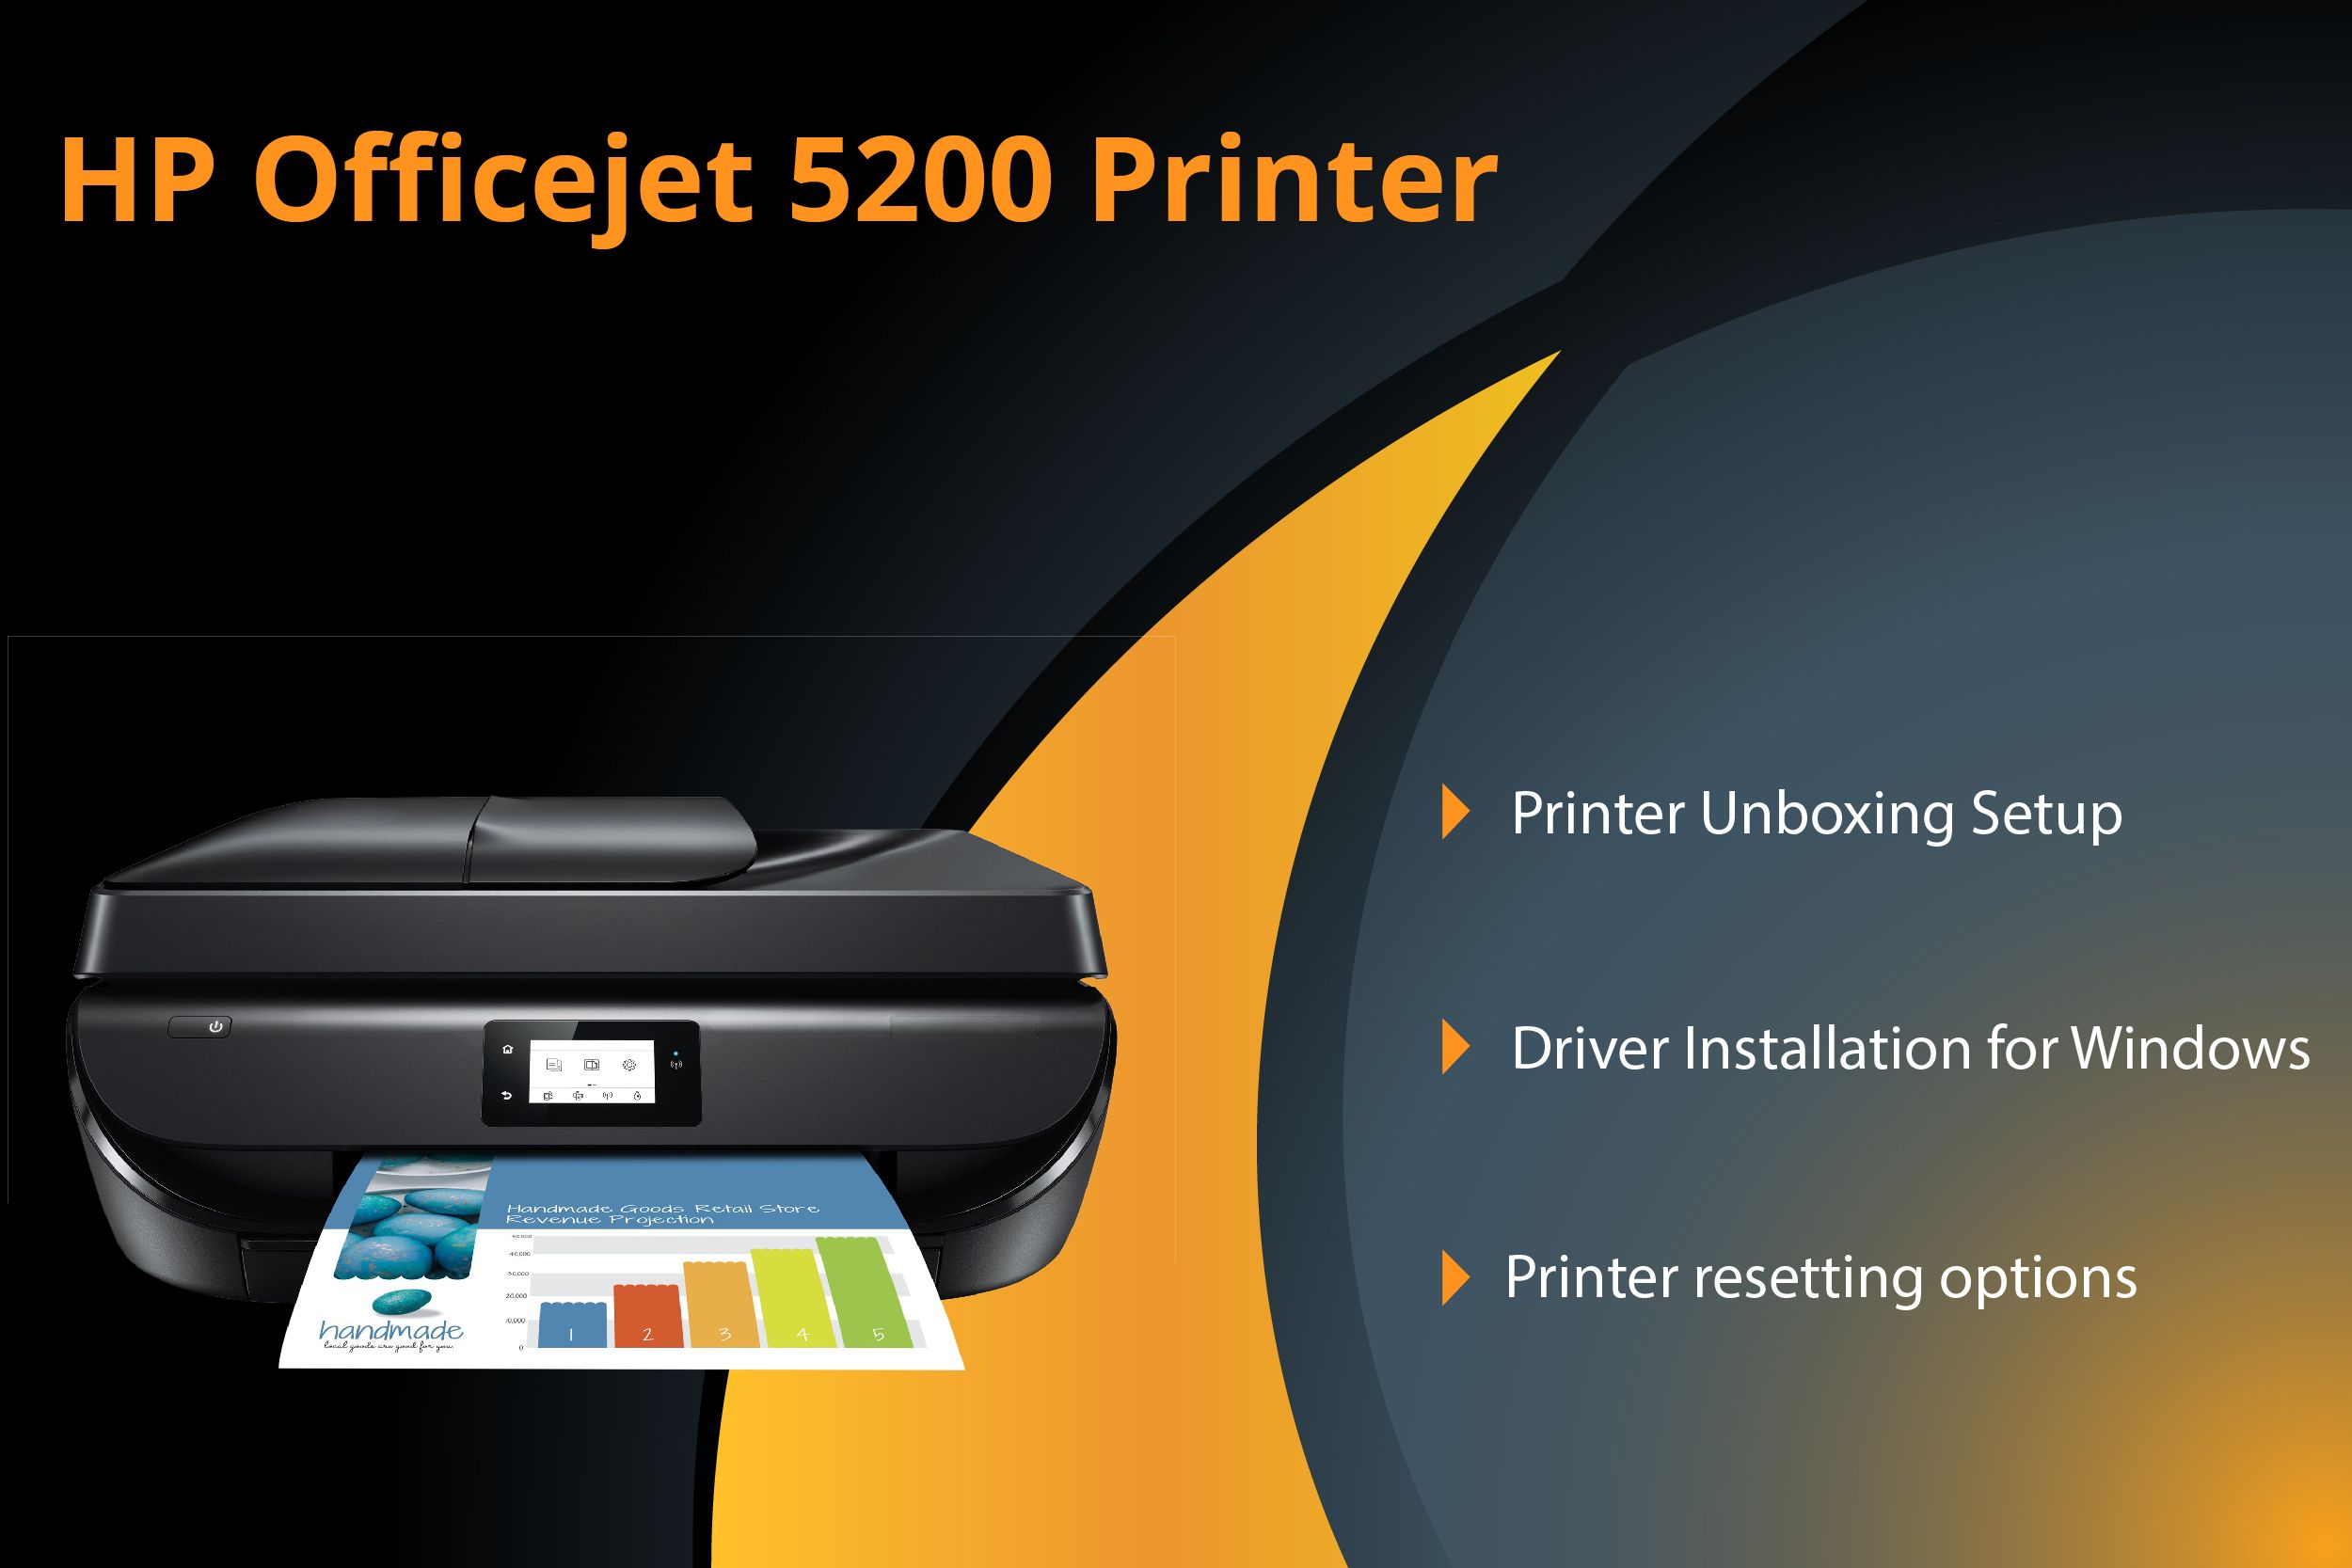 Guidelines for HP Officejet 5200 printer unboxing setup